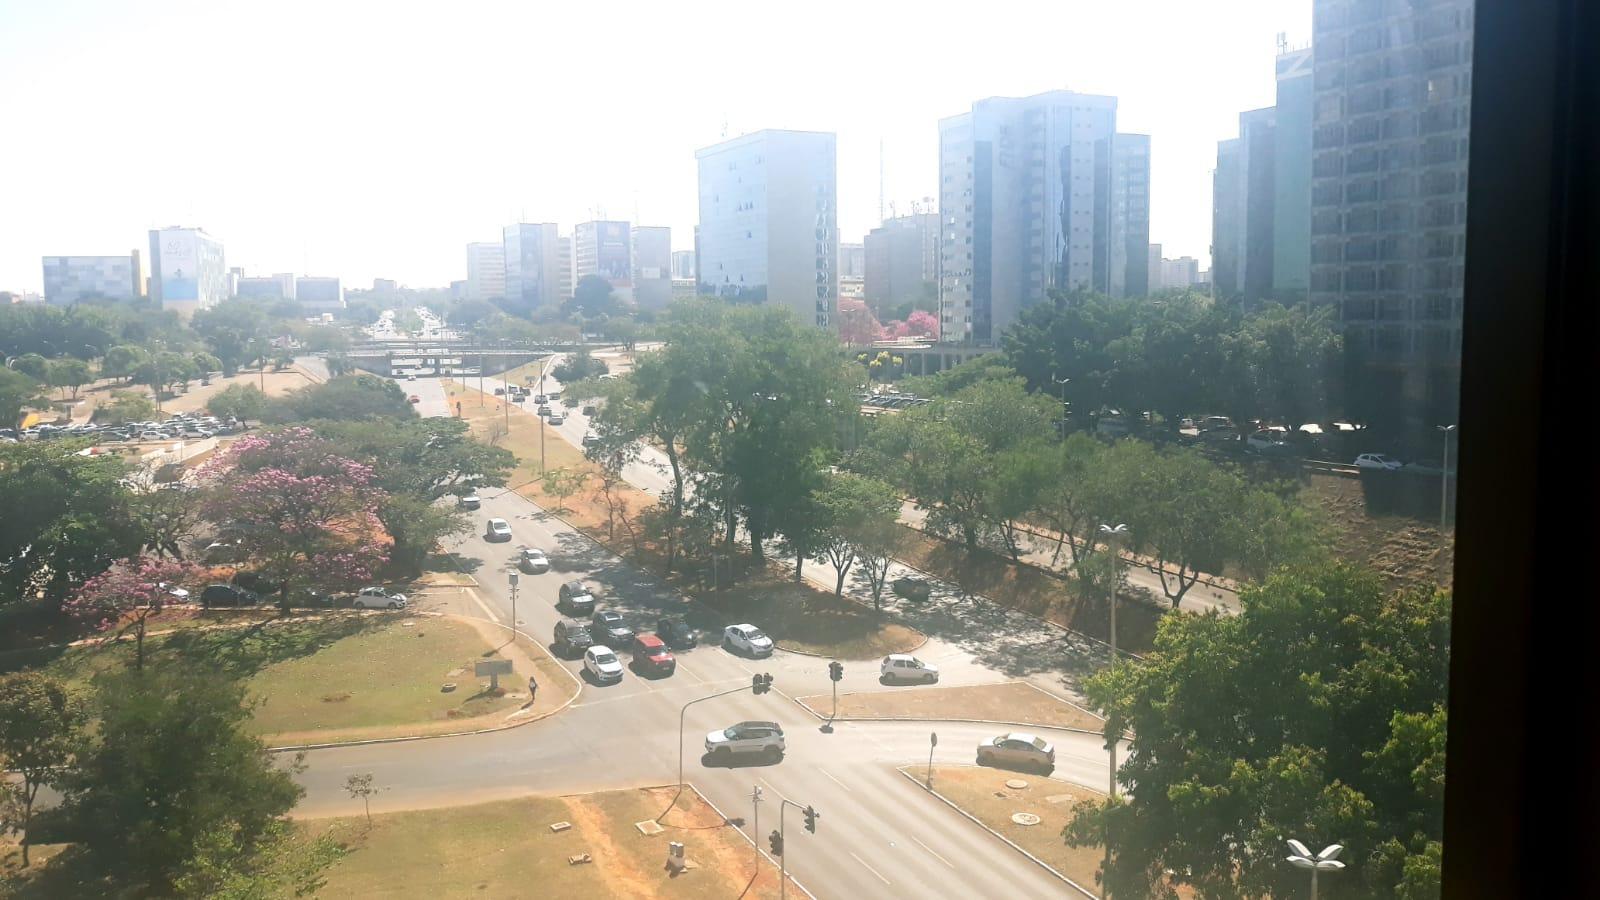 Alugo sala 27m², andar alto, Setor de Autarquias Sul, vaga dupla, Asa Sul, Brasília - DF